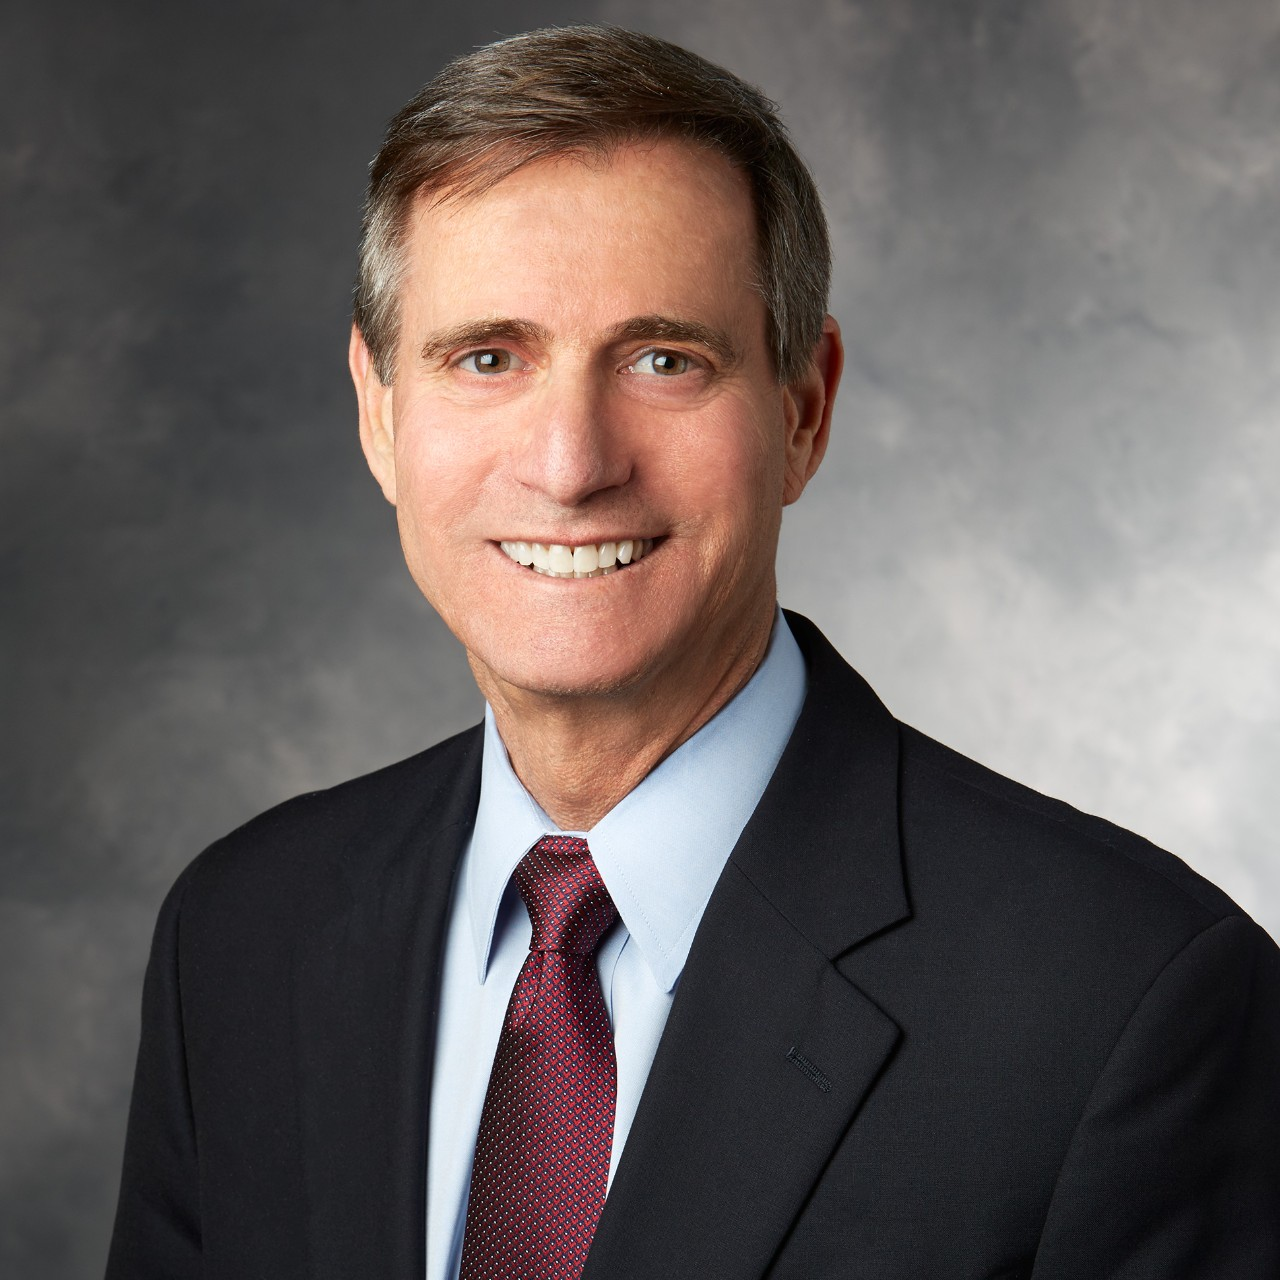 David J Maron Stanford Health Care